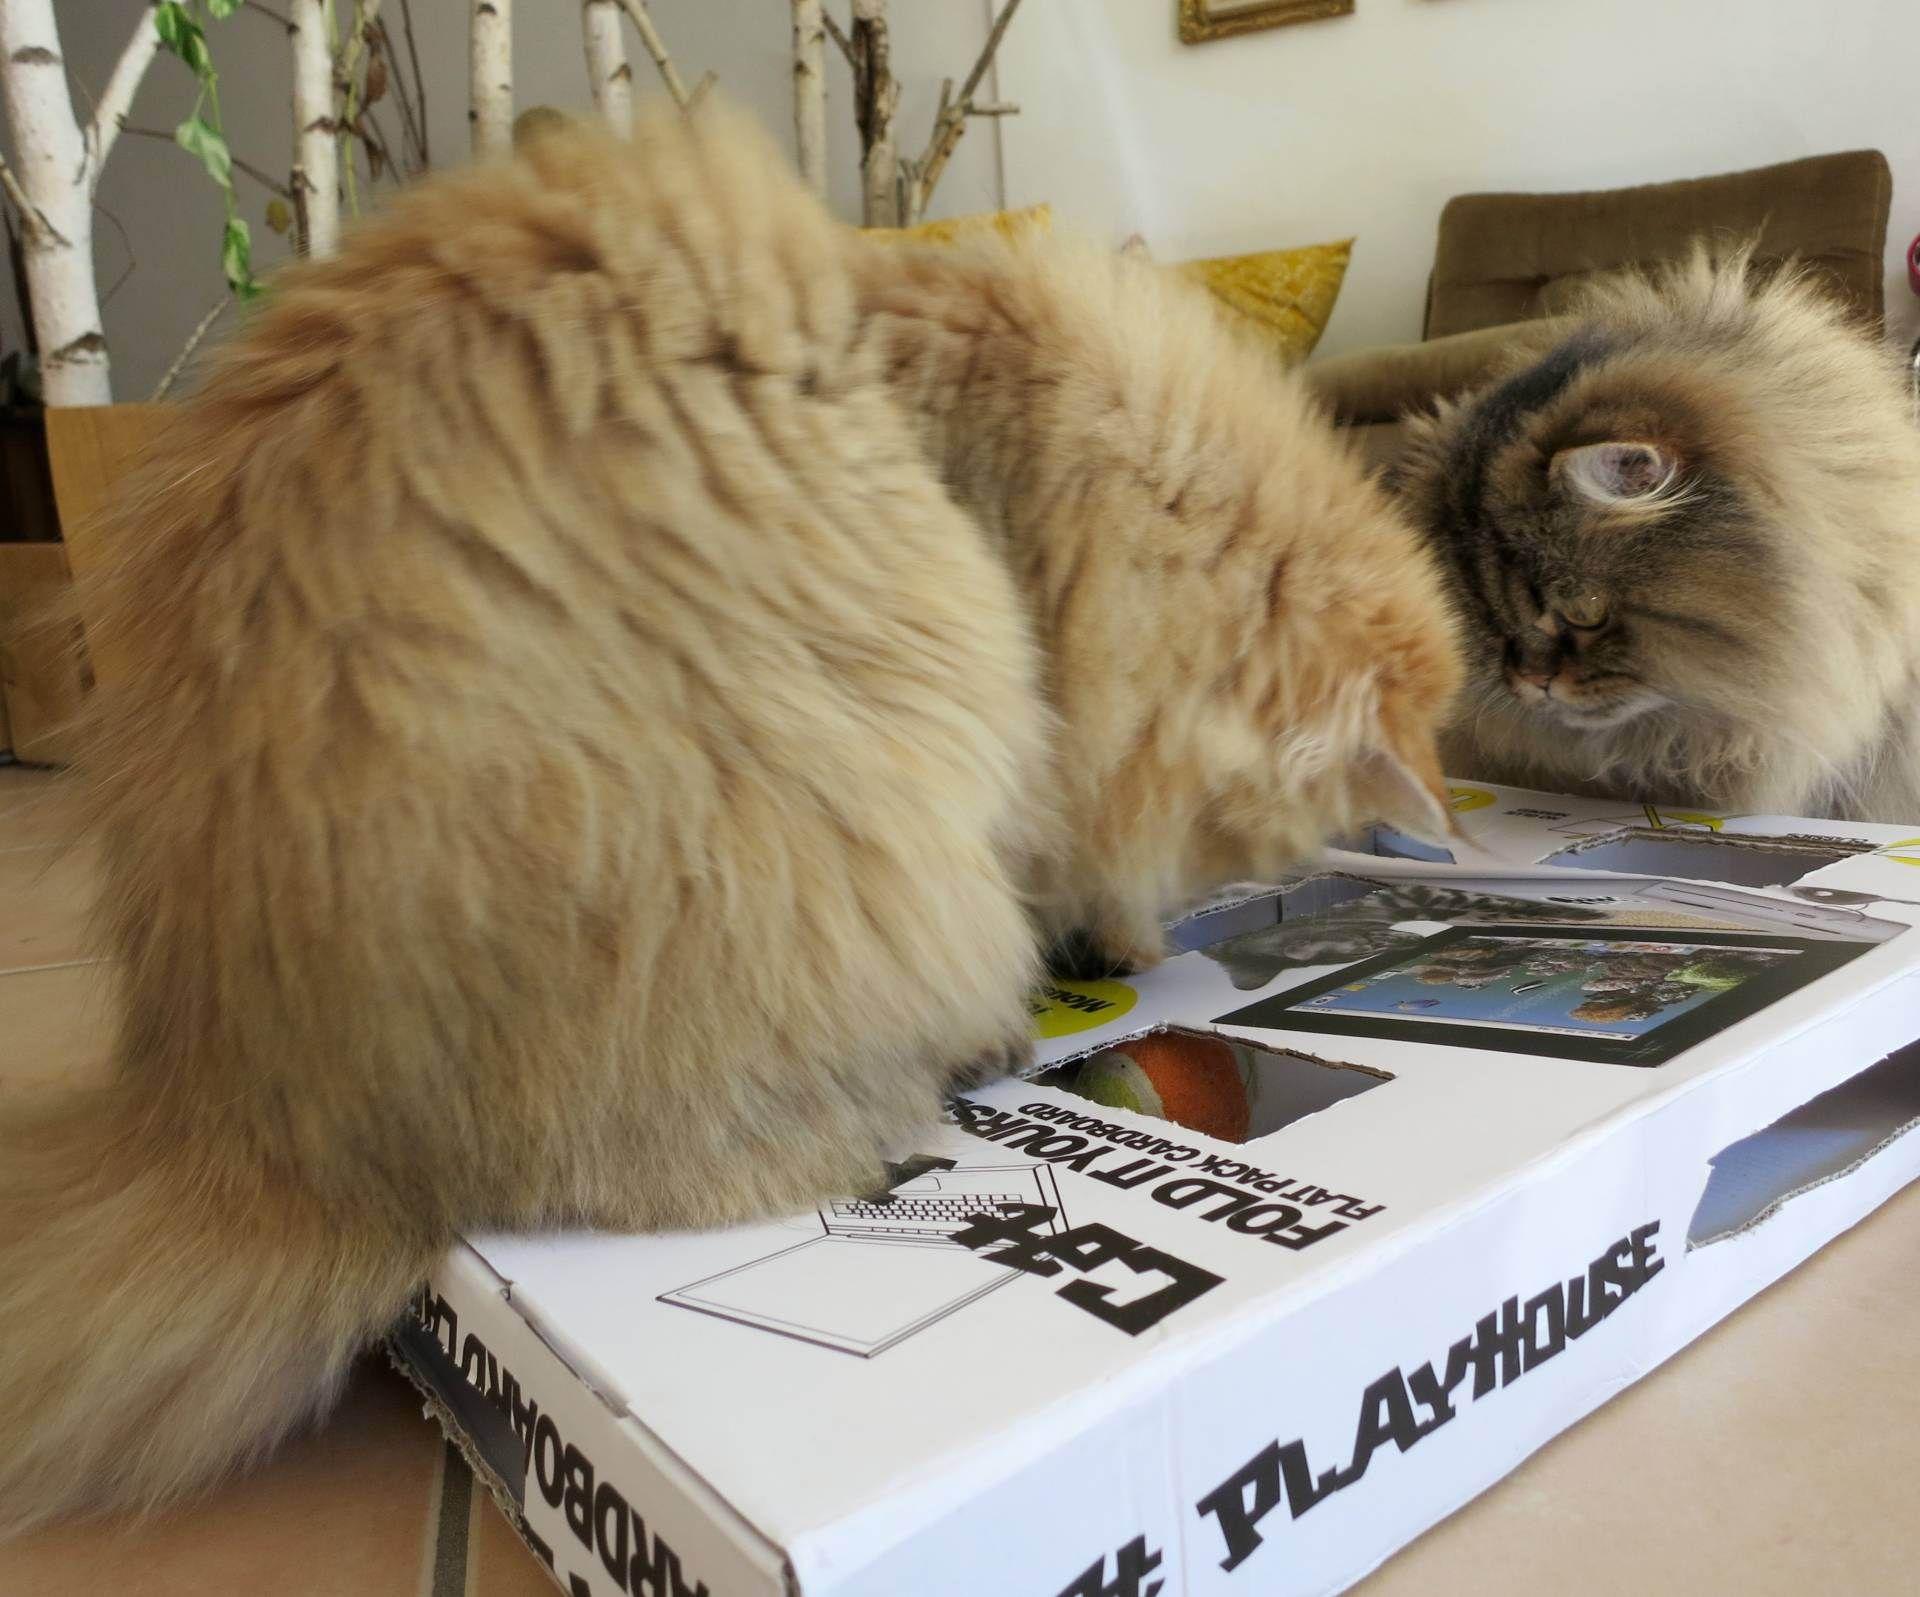 DIY Cardboard Treat Puzzle Diy cat treats, Cat furniture